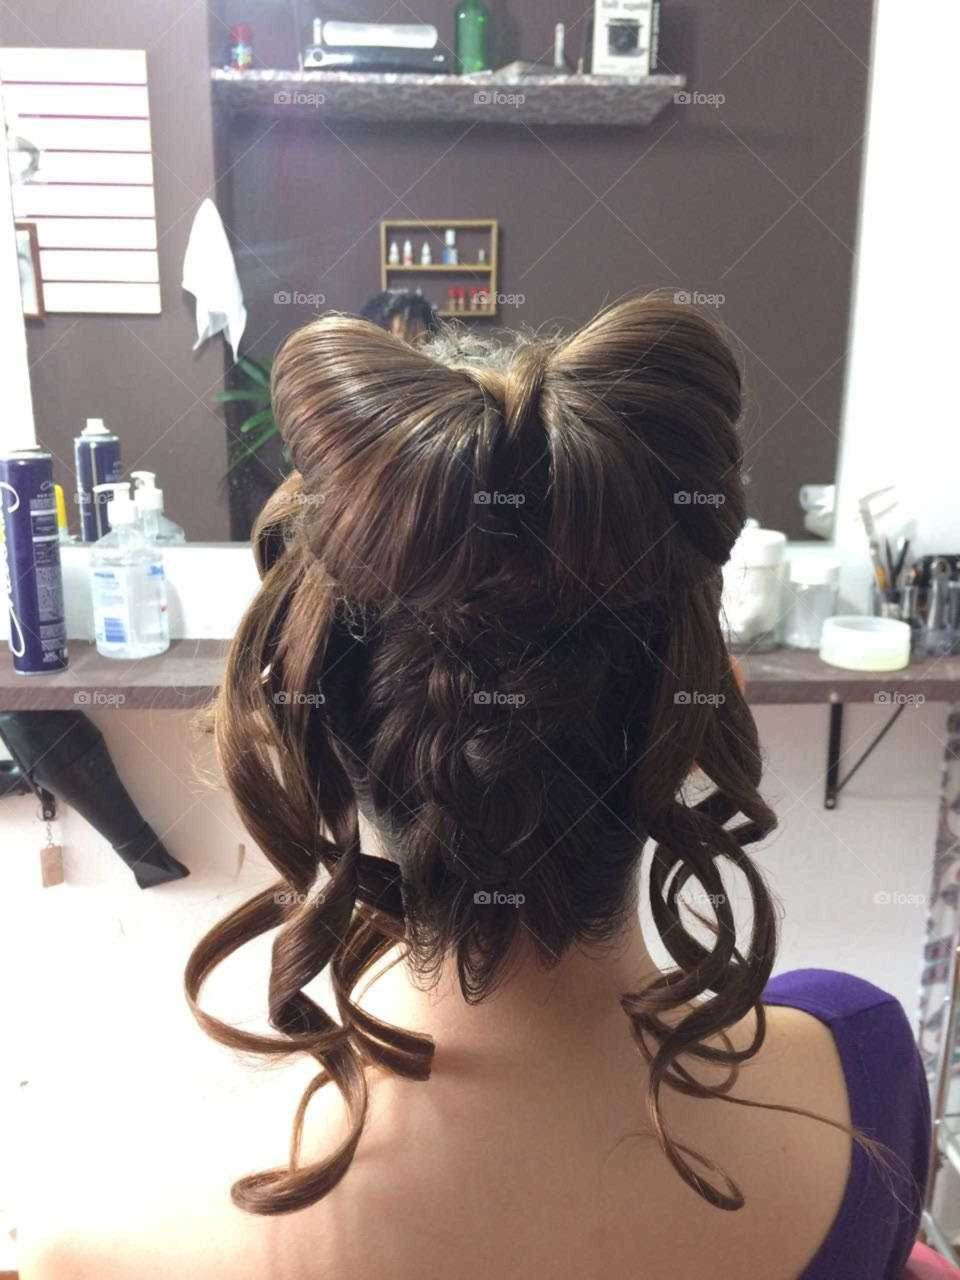 laço de cabelo